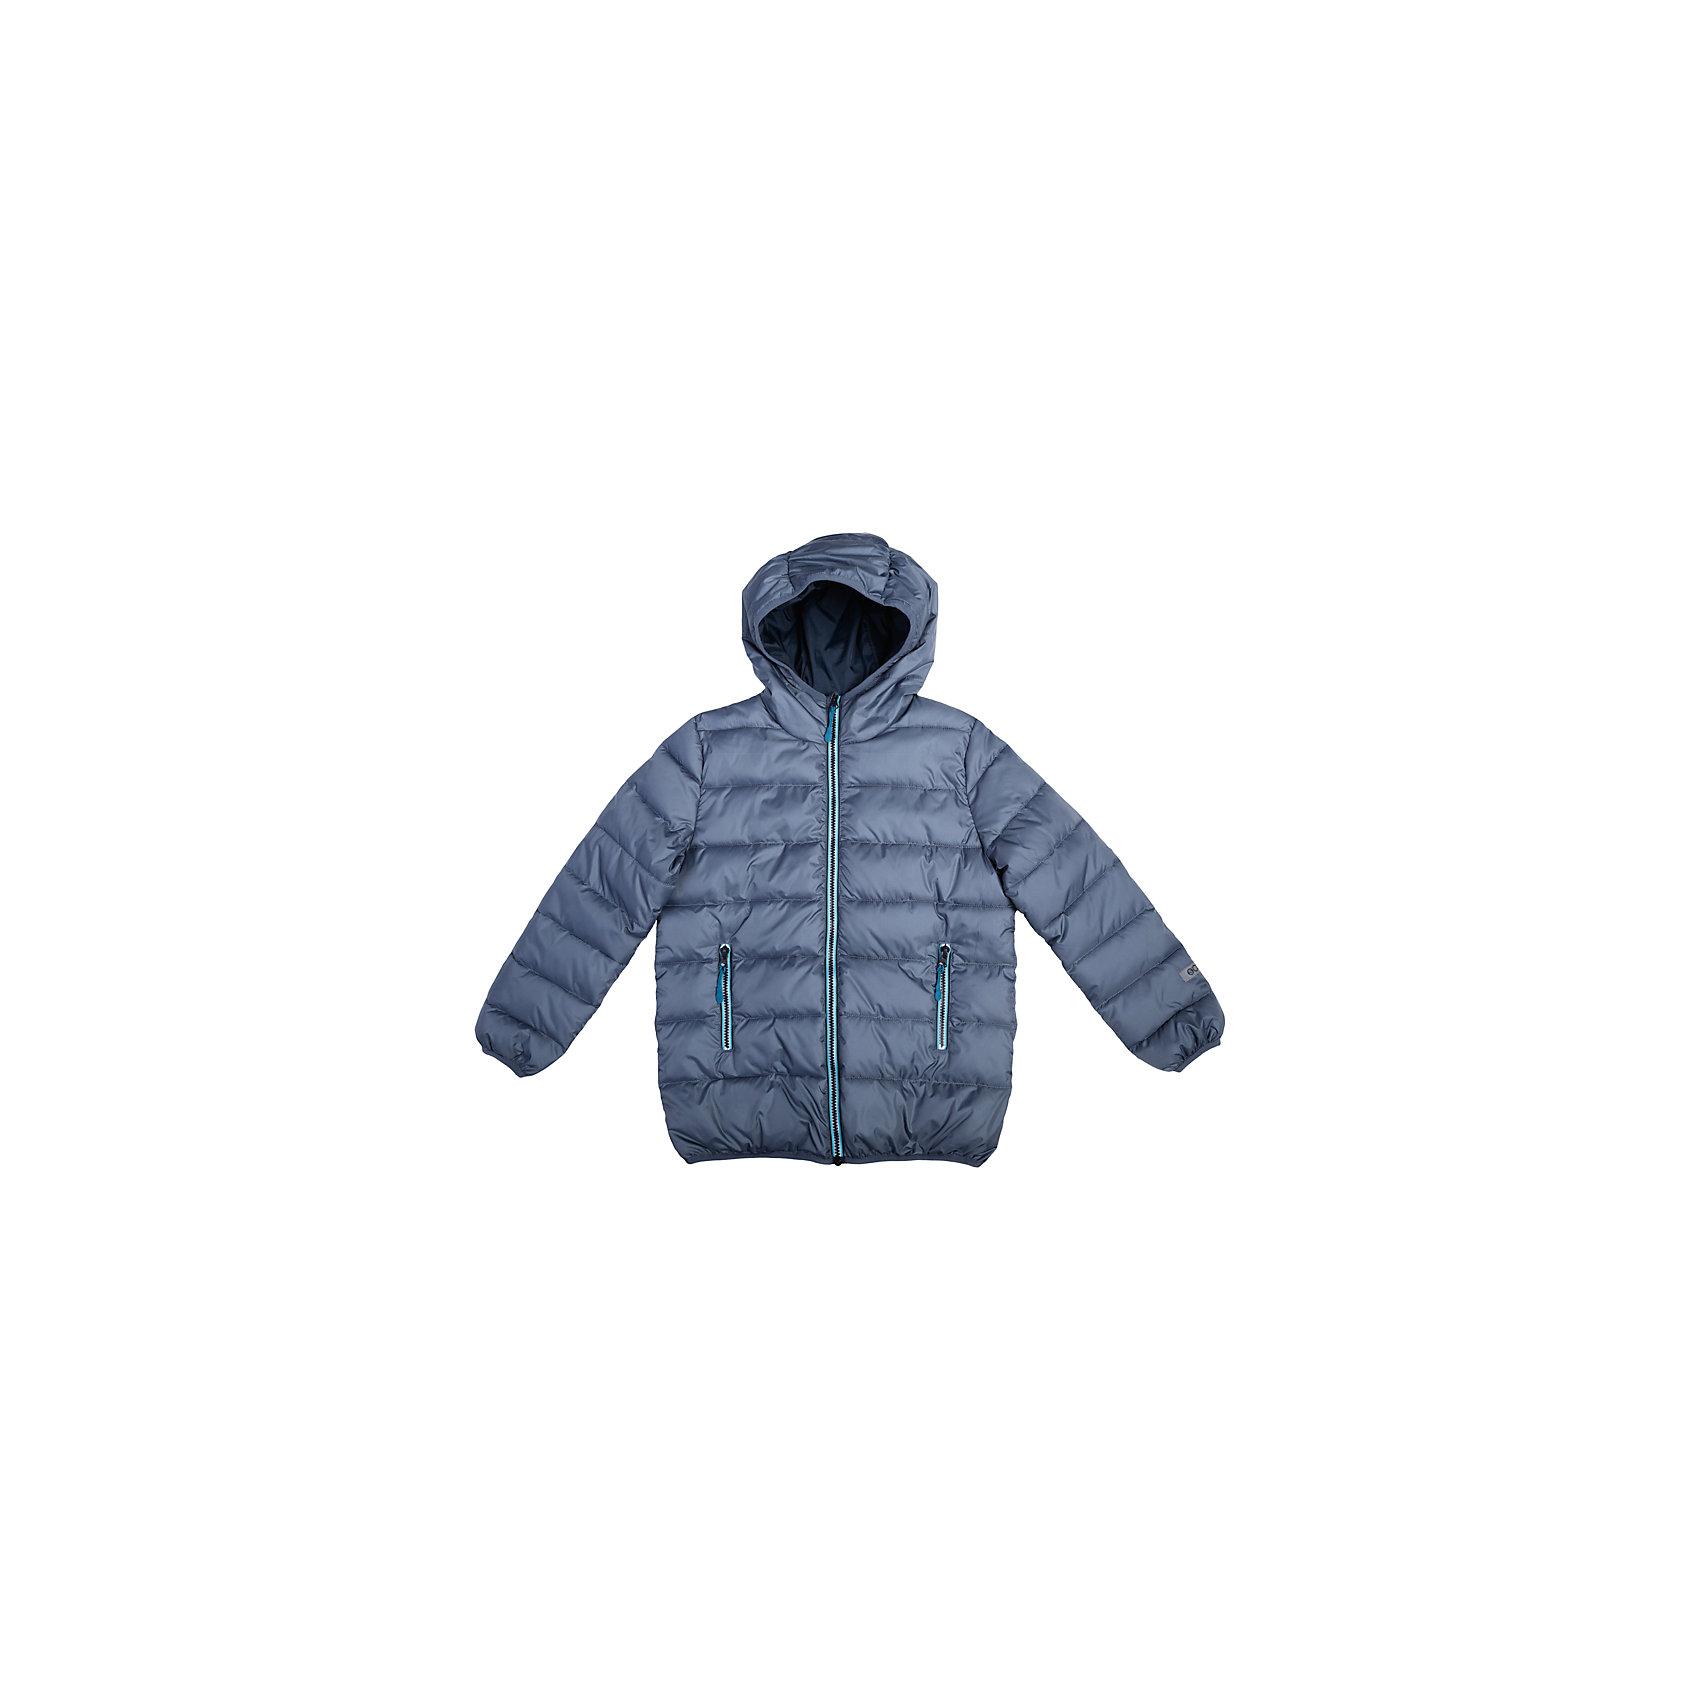 S'cool Куртка для мальчика S'cool